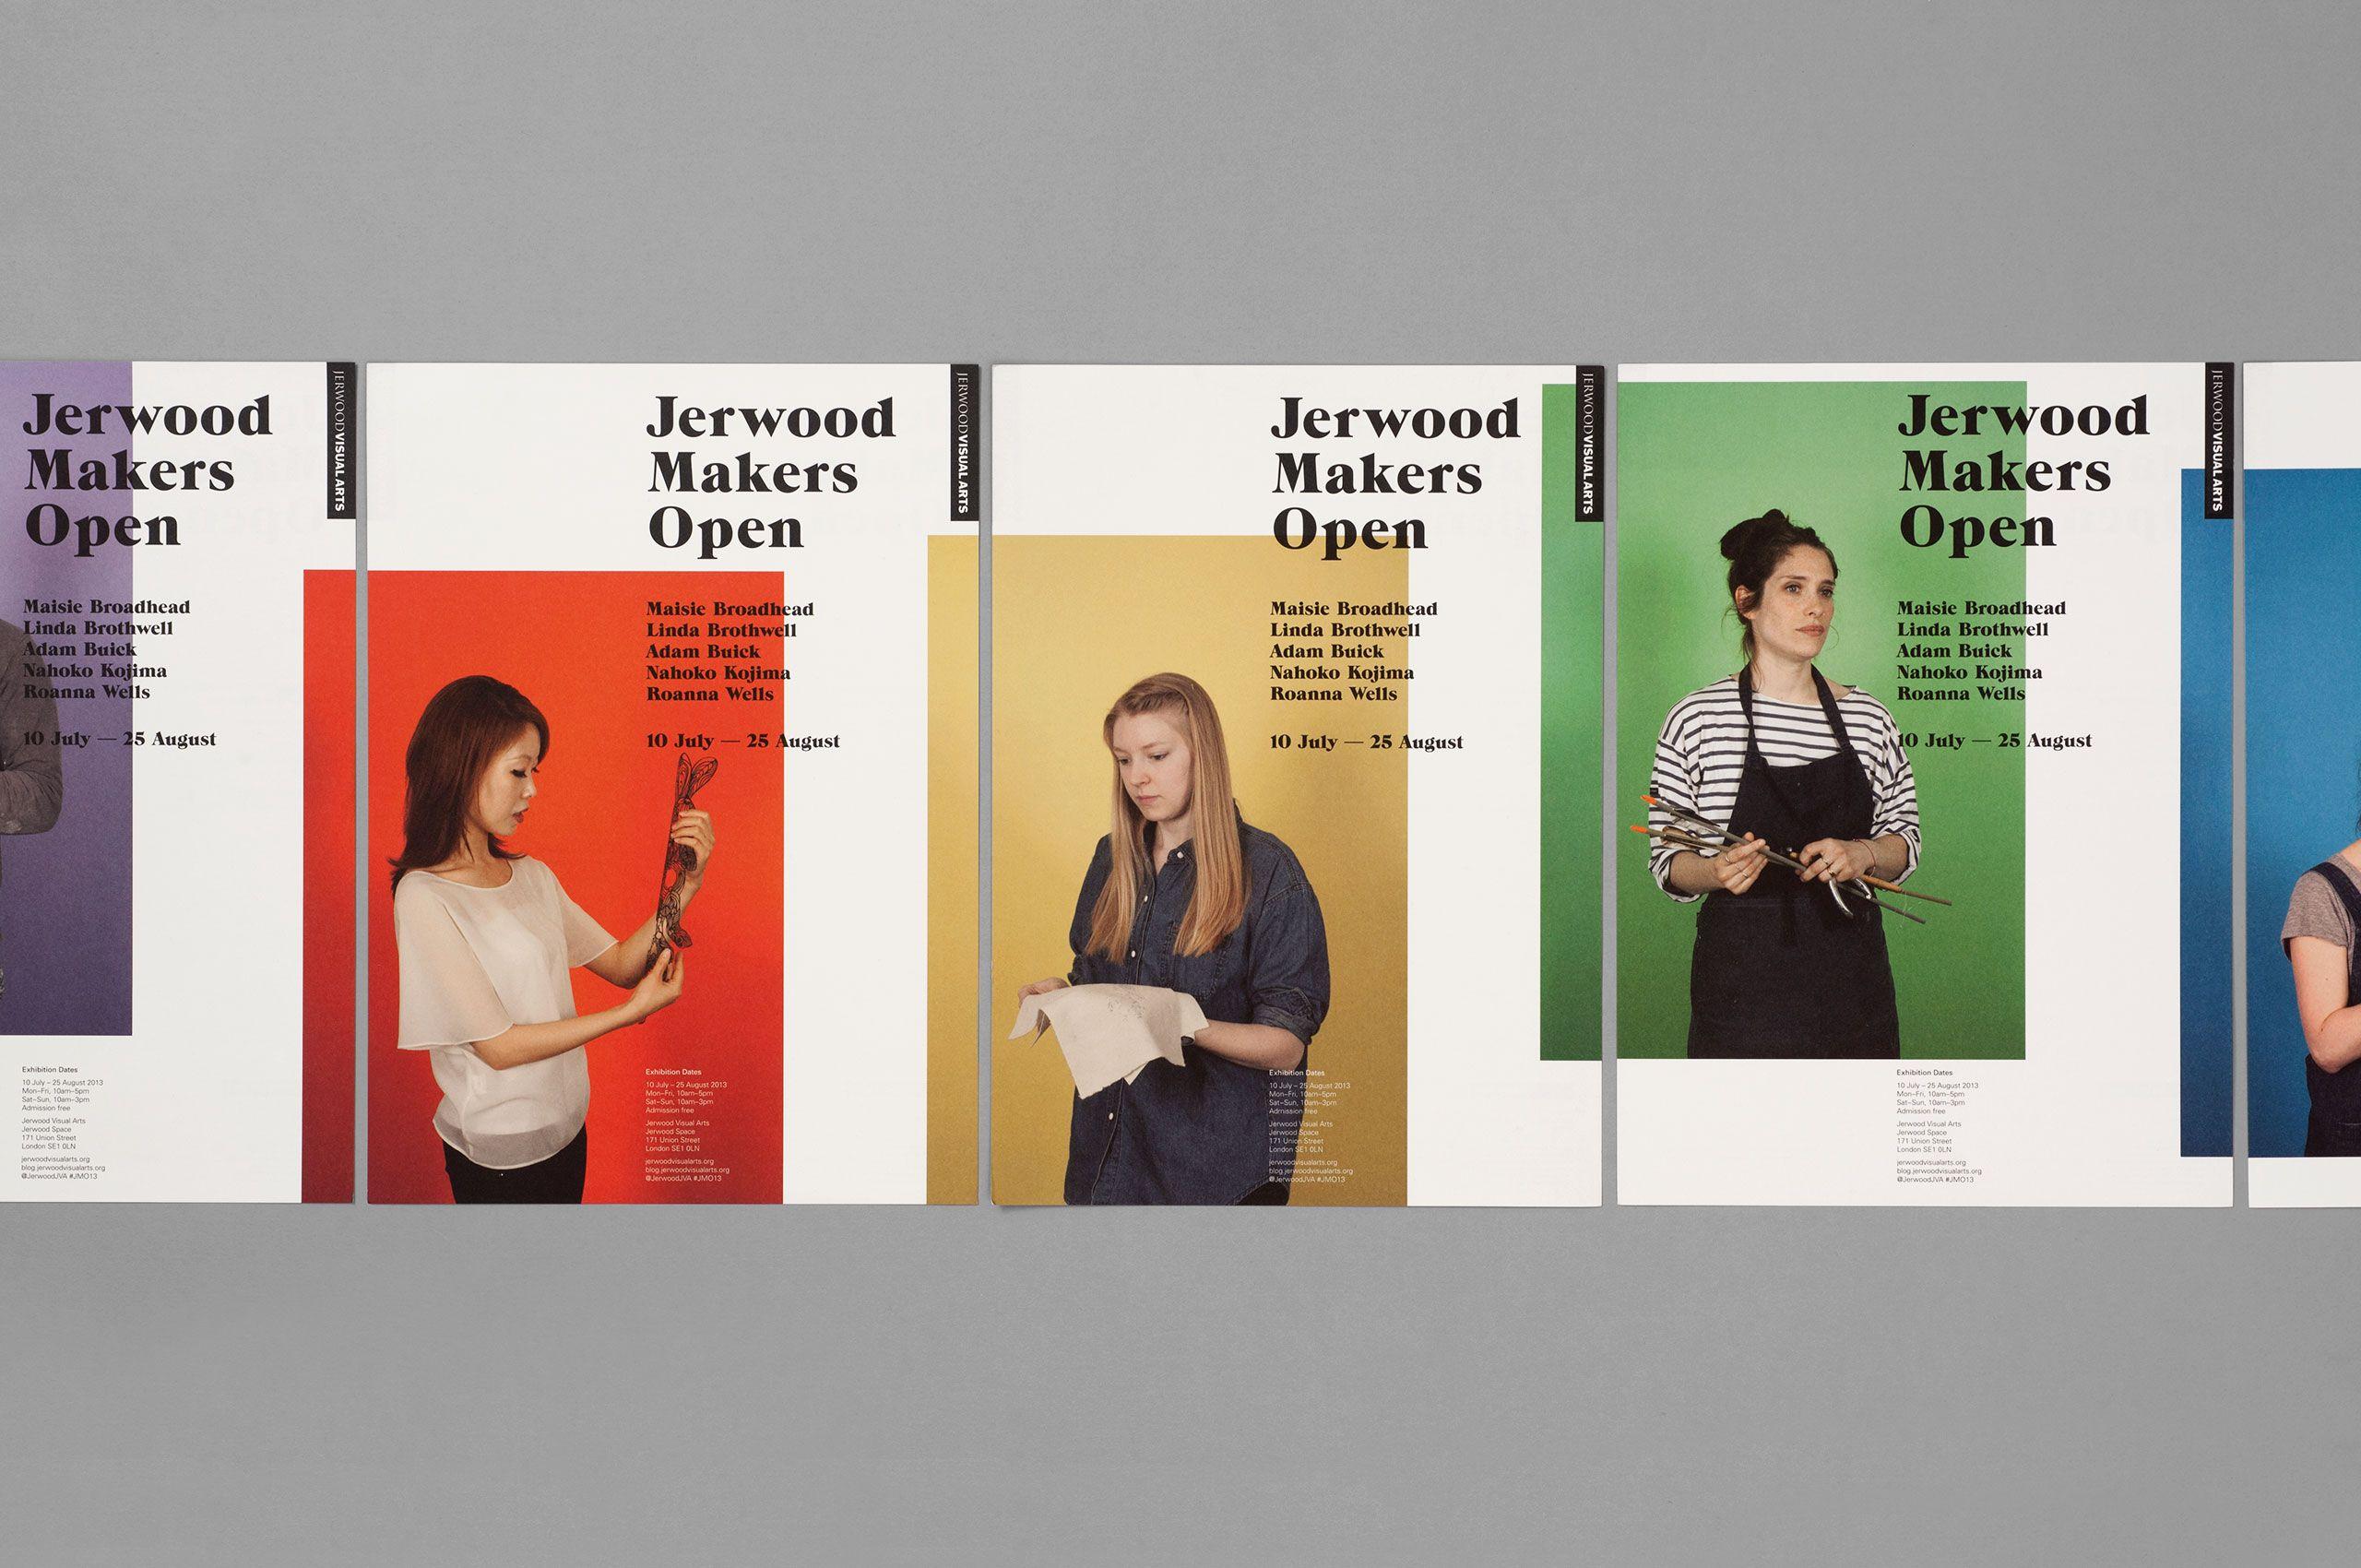 Burgess & Beech is a multidisciplinary design practice